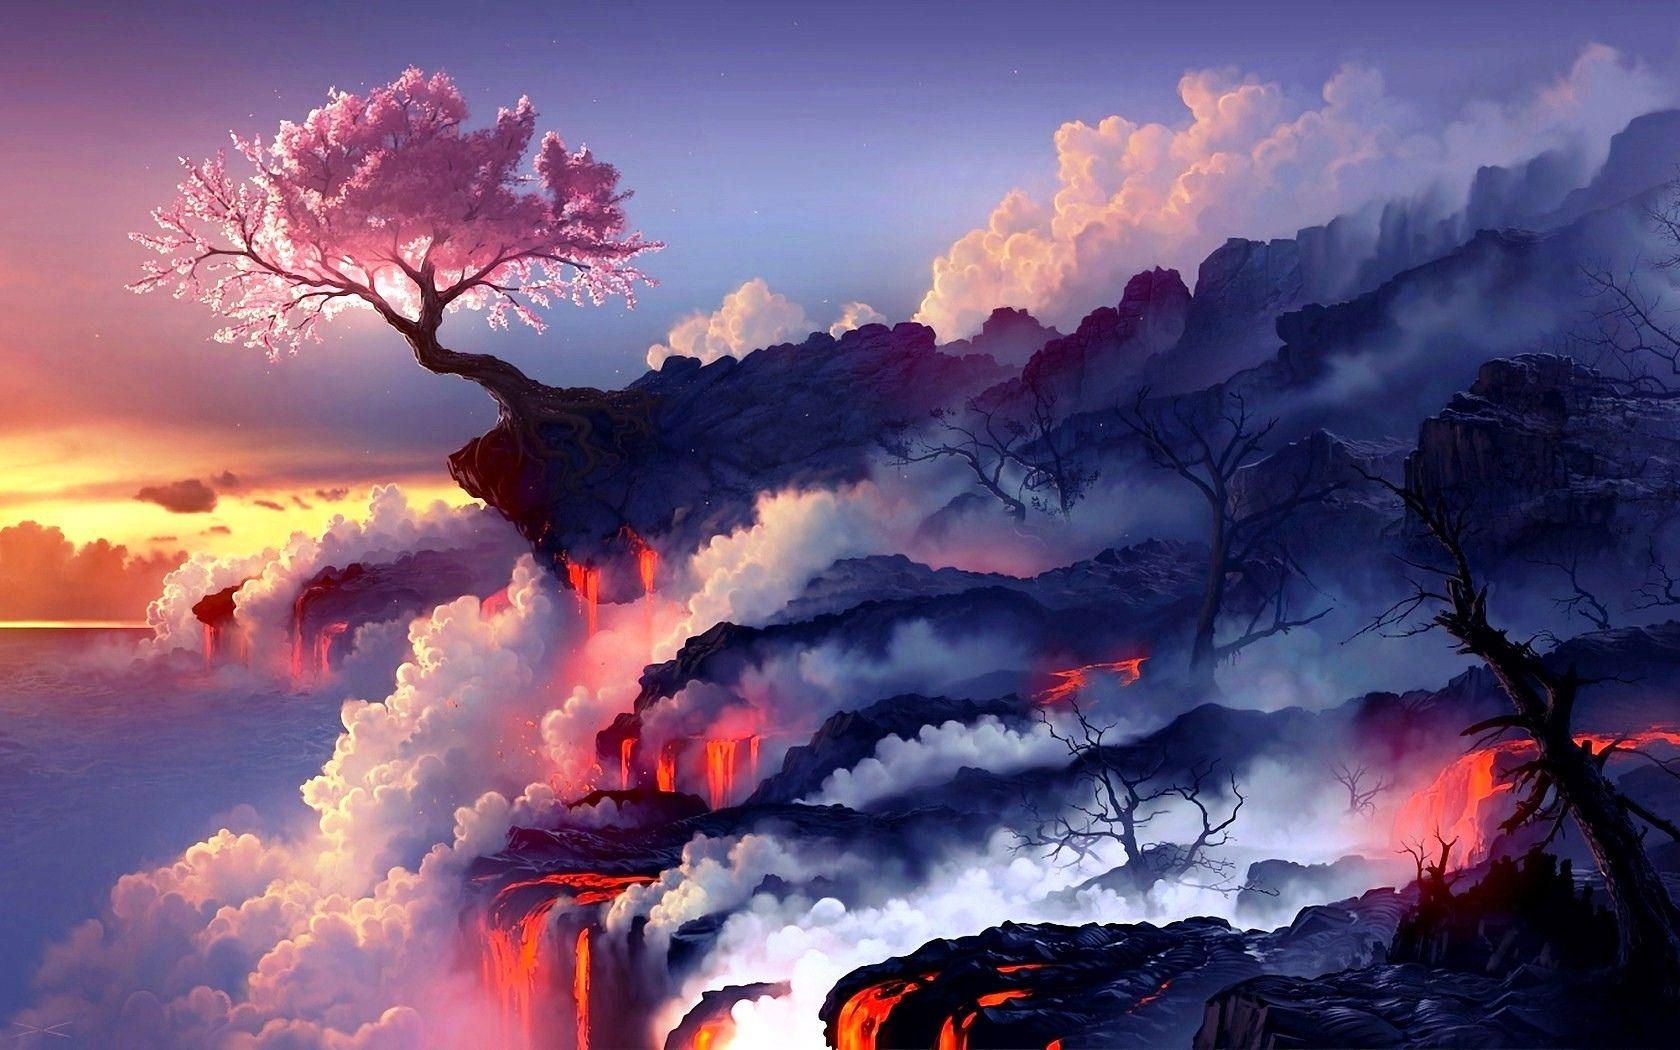 Game Magic The Gathering Landscape Sakura Blossom Sakura Tree Wallpaper Scenery Wallpaper Fantasy Landscape Anime Scenery Wallpaper